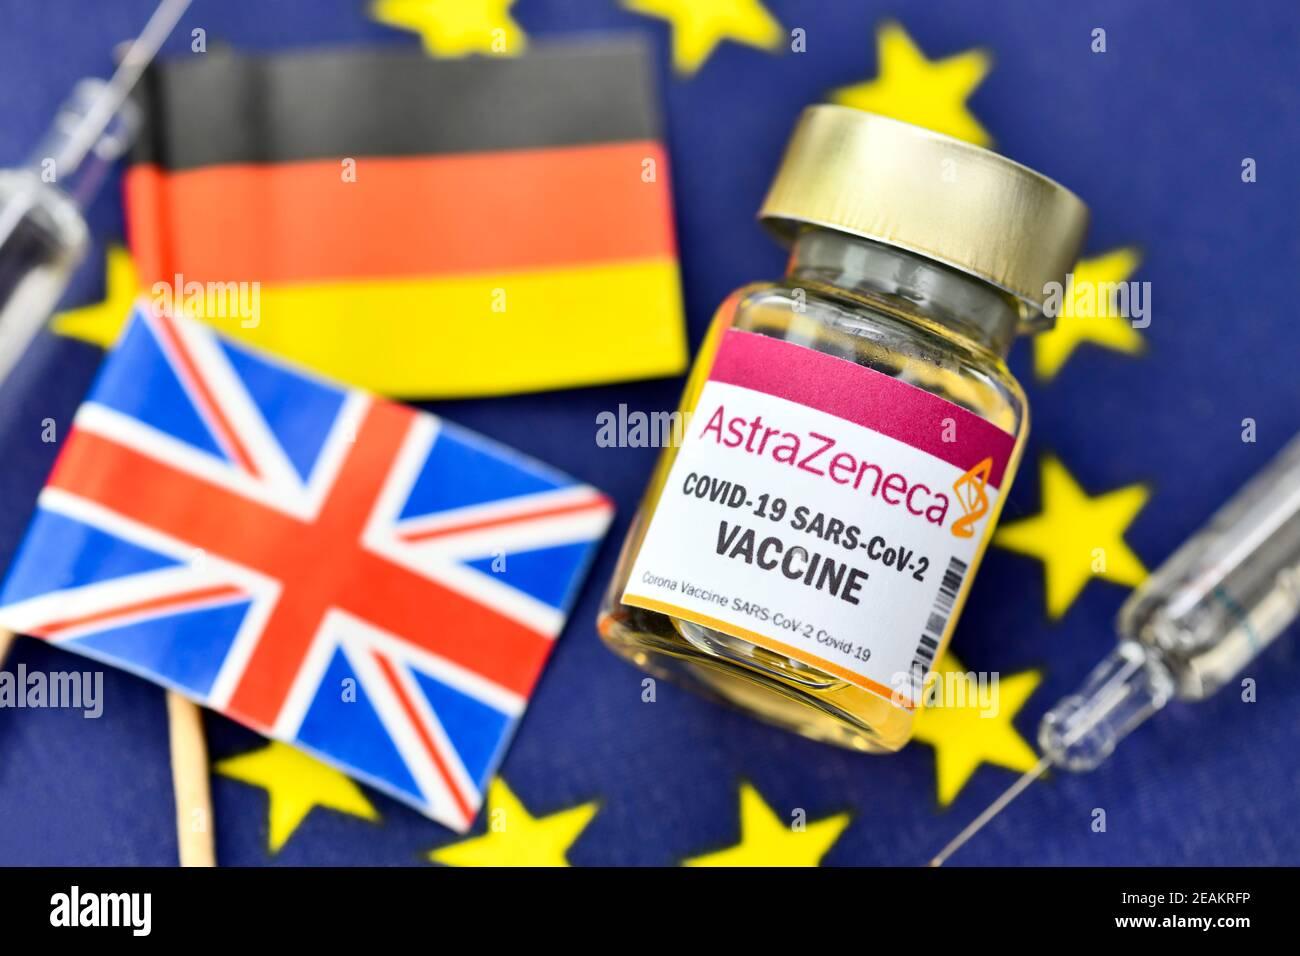 Vaccine Vial On EU Flag, AstraZeneca Vaccine Supply Stock Photo